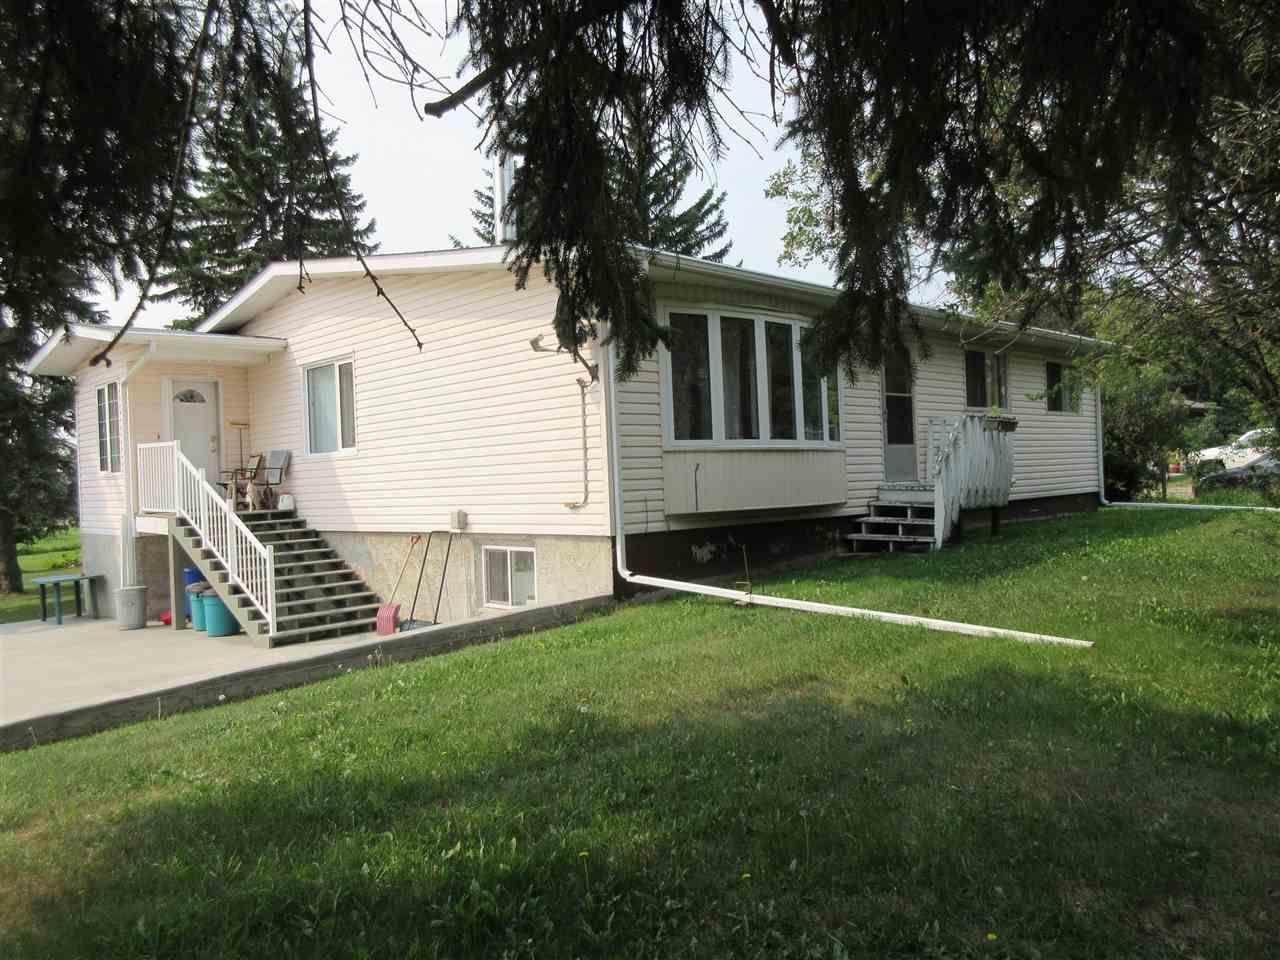 Main Photo: 1507 195 Avenue in Edmonton: Zone 51 House for sale : MLS®# E4155036